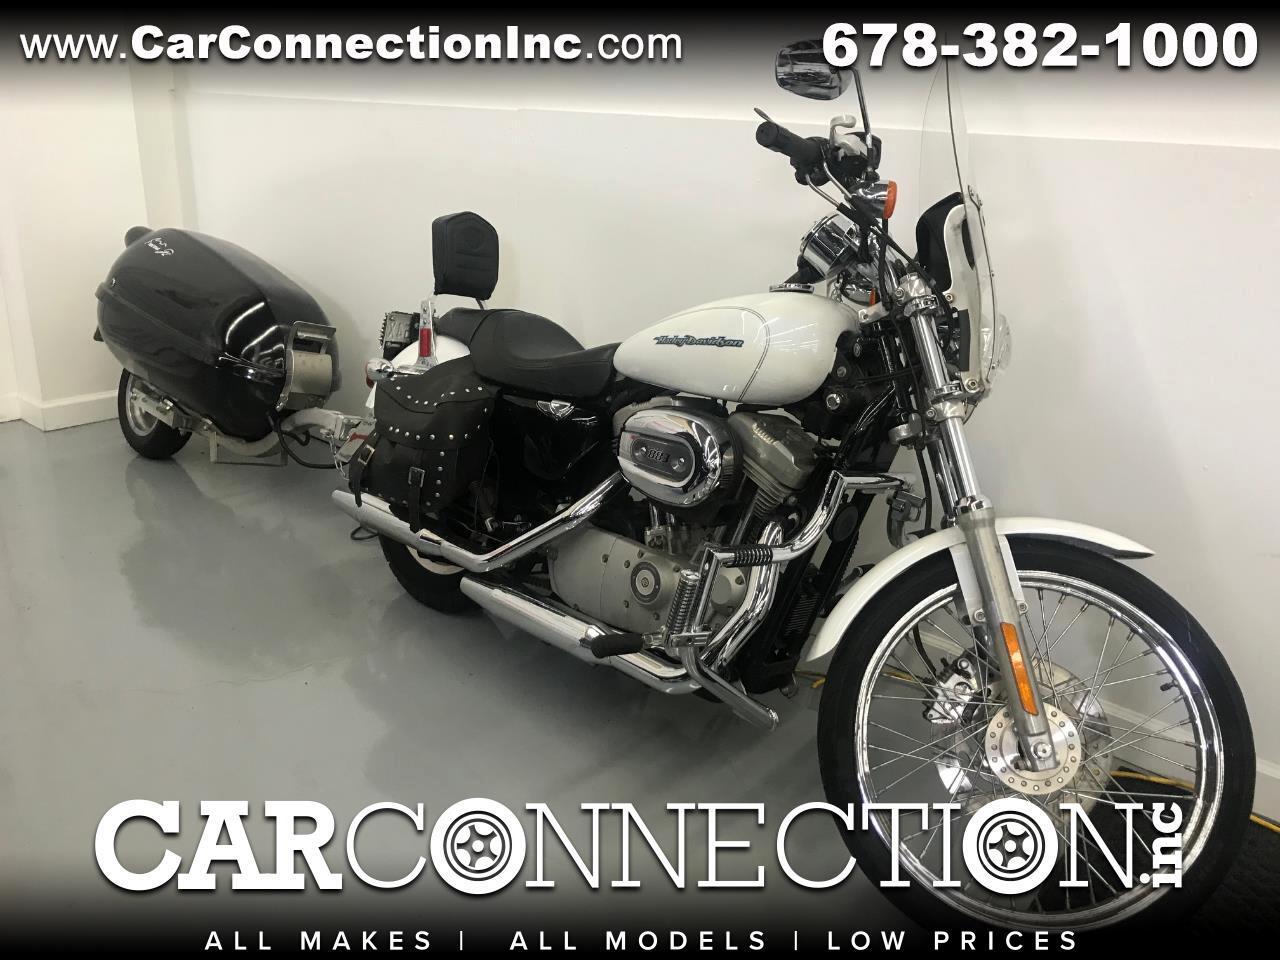 2004 Harley-Davidson Sportster XL883C Sportster 883 Custom